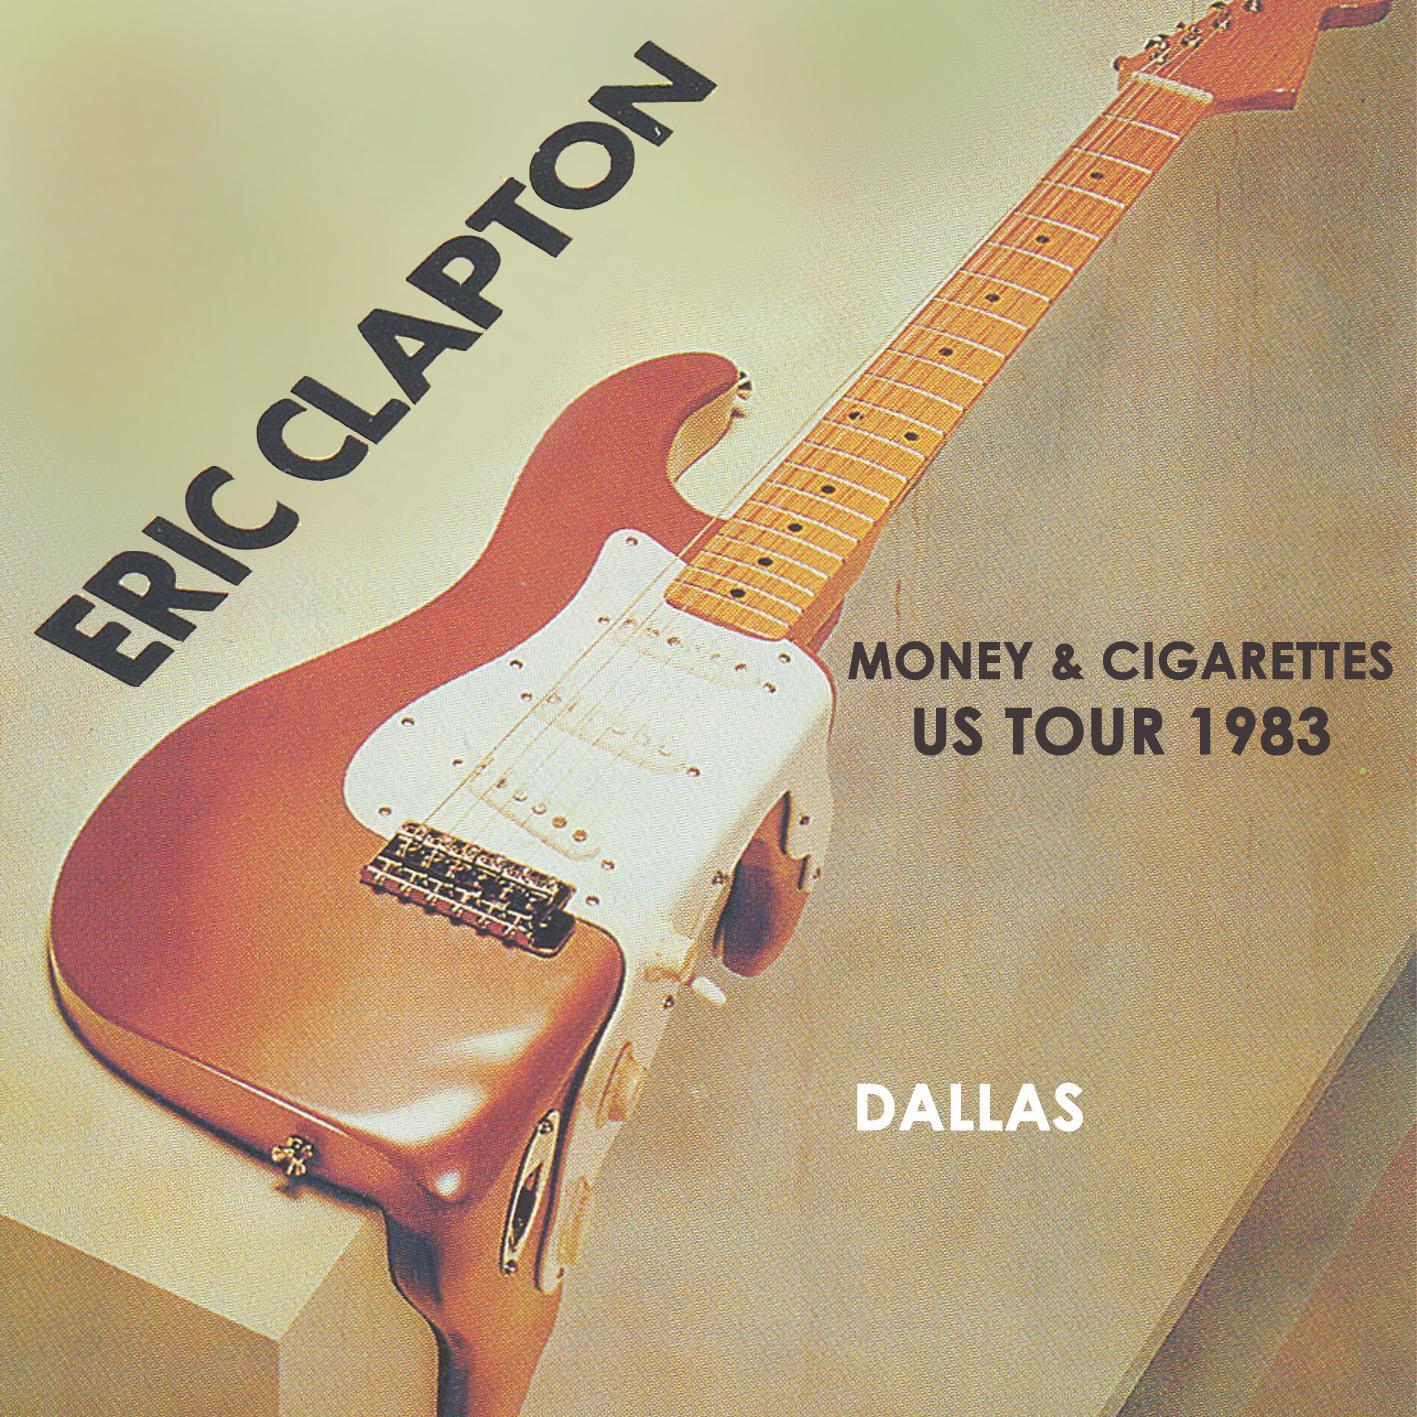 Eric Clapton Reunion Arena Dallas Texas February 15 1983 Torrent